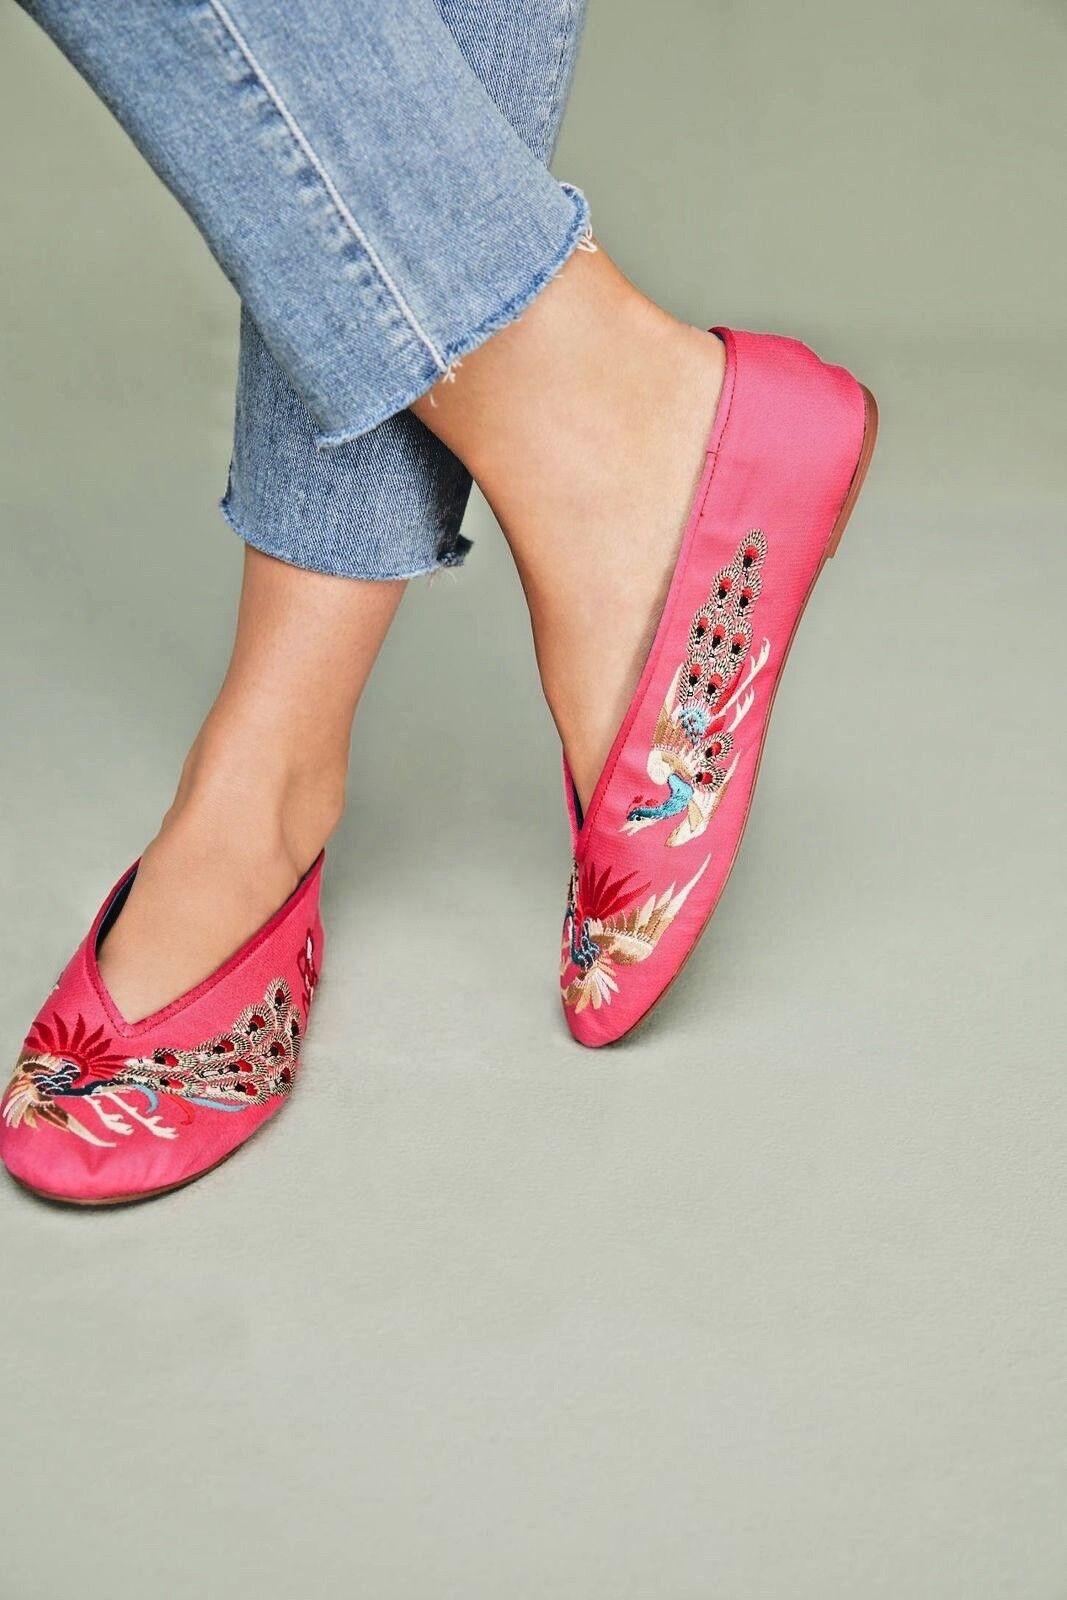 ANTHROPOLOGIE NEW LLANI Embellished Satin Bead Ballet chaussures rose Flats Sz 8